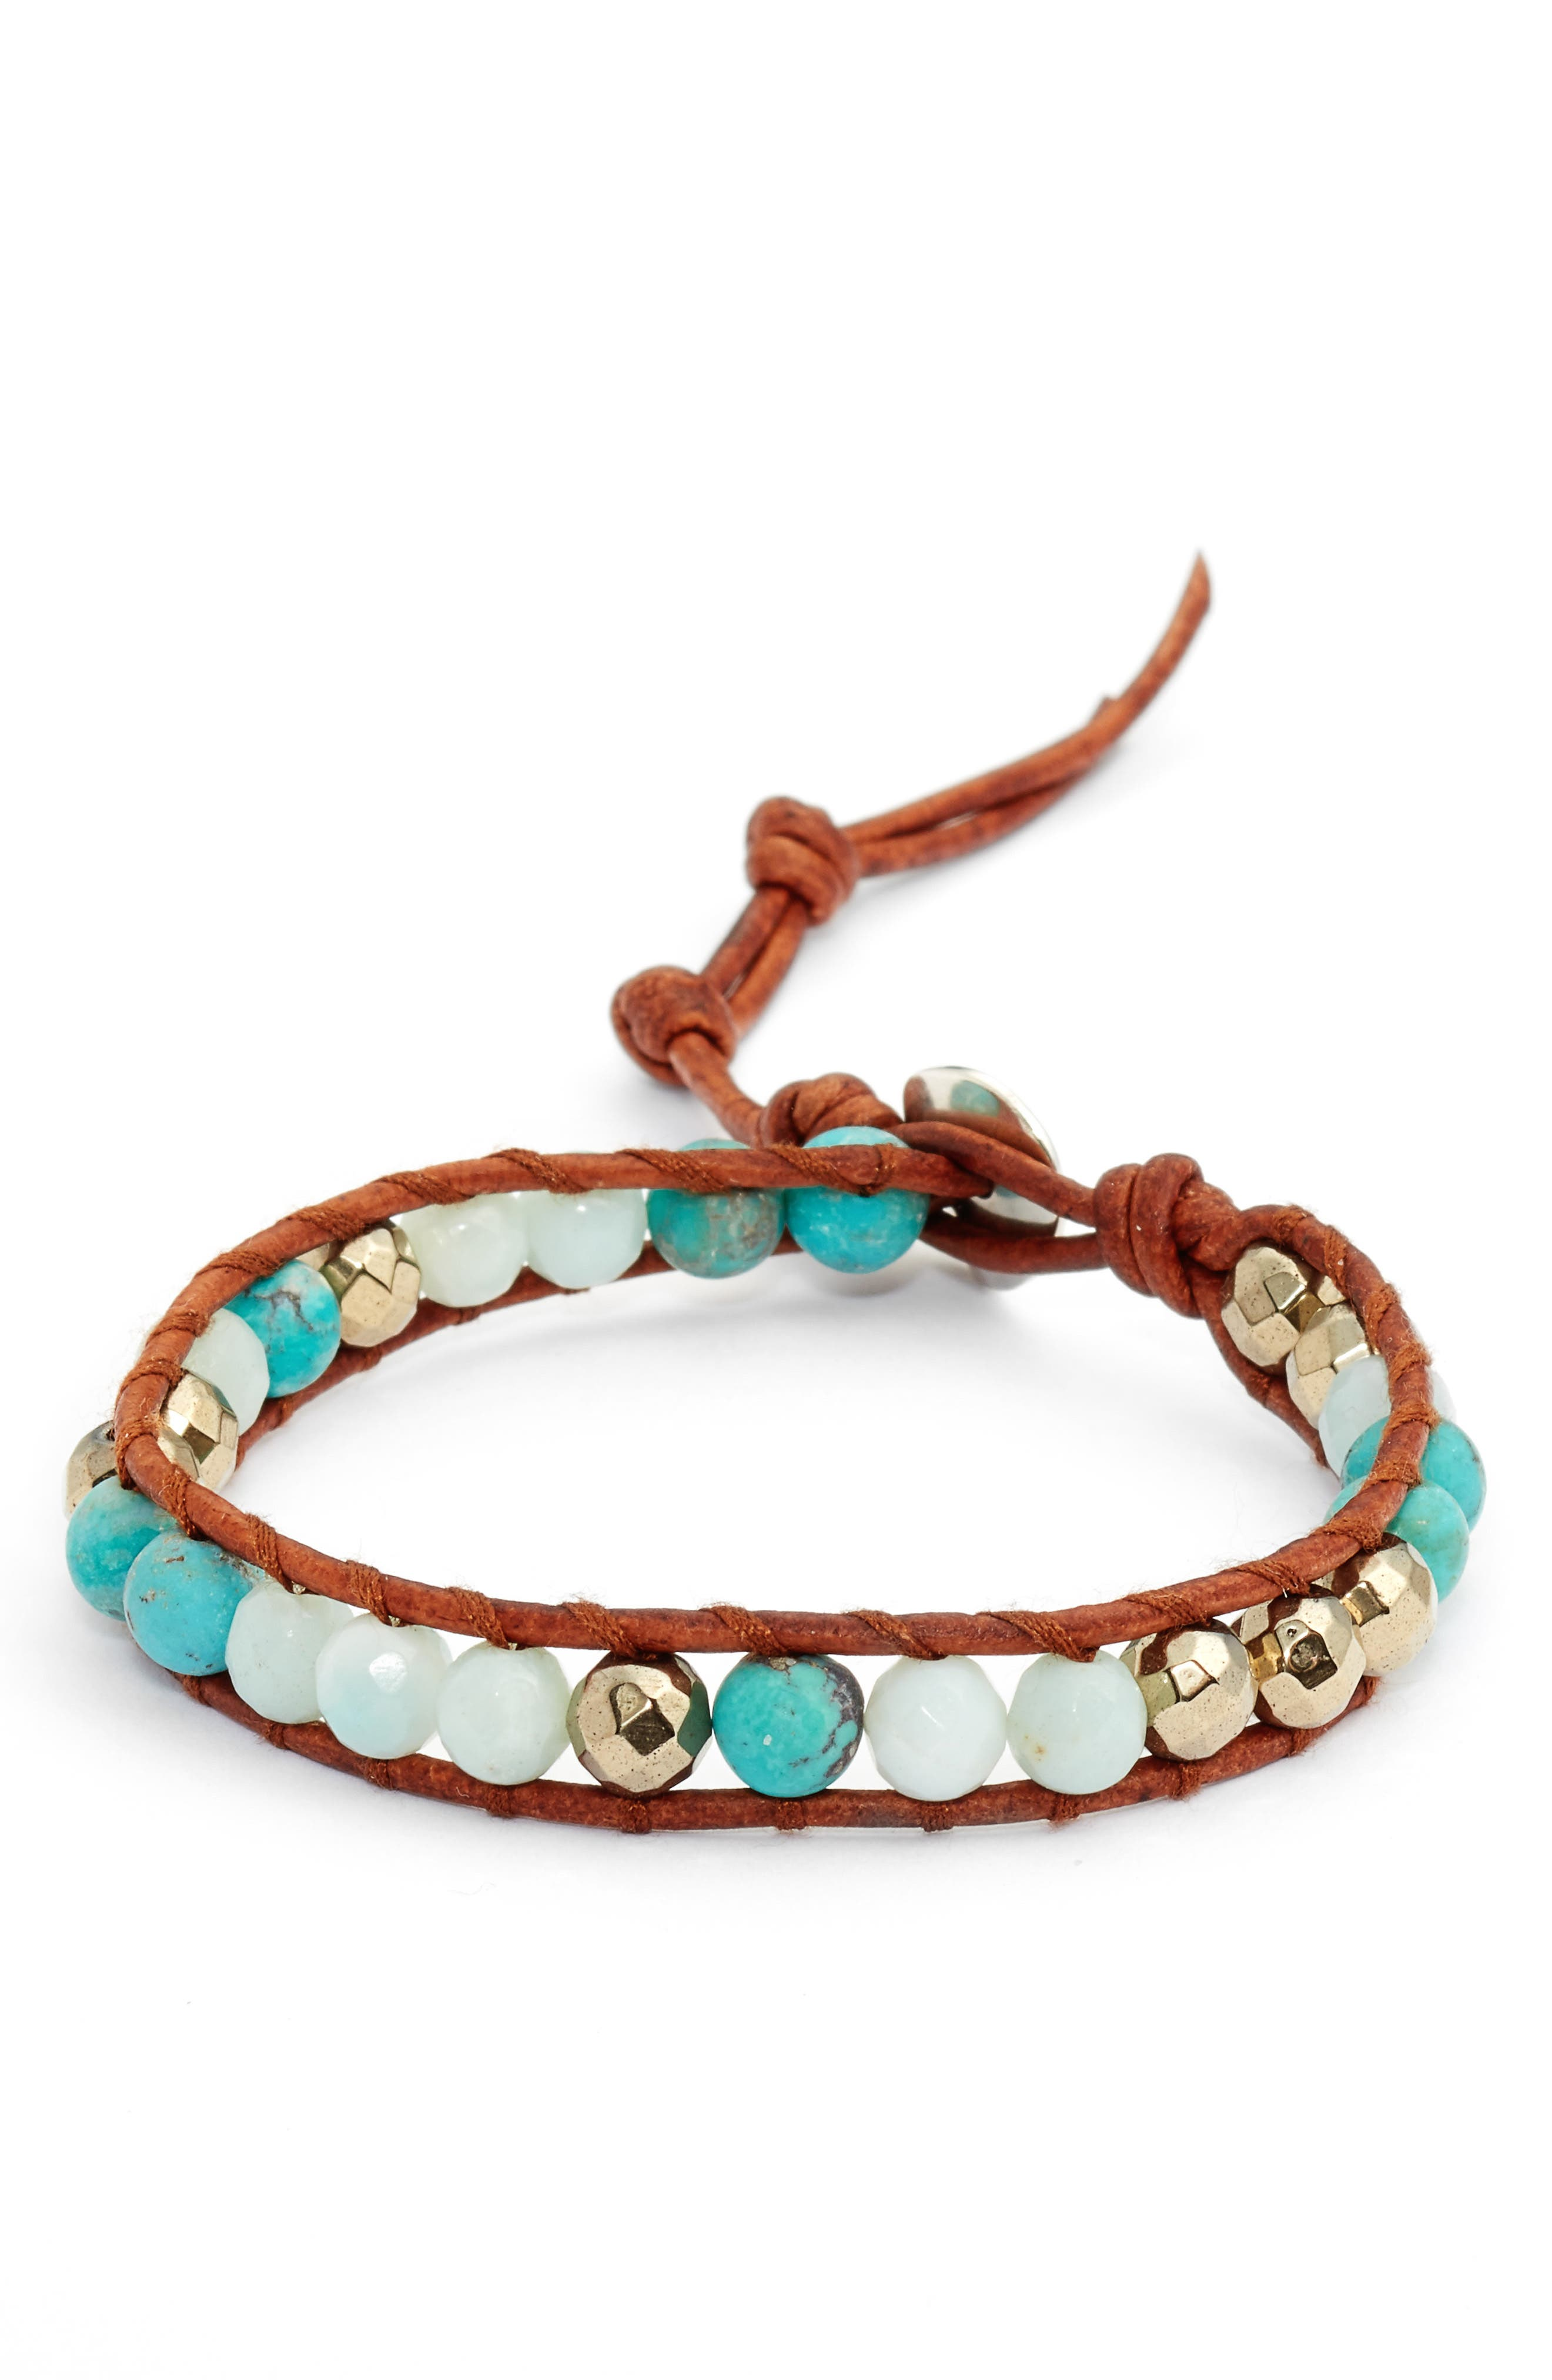 Mixed Semiprecious Stone Bracelet,                             Main thumbnail 1, color,                             Turquoise Mix